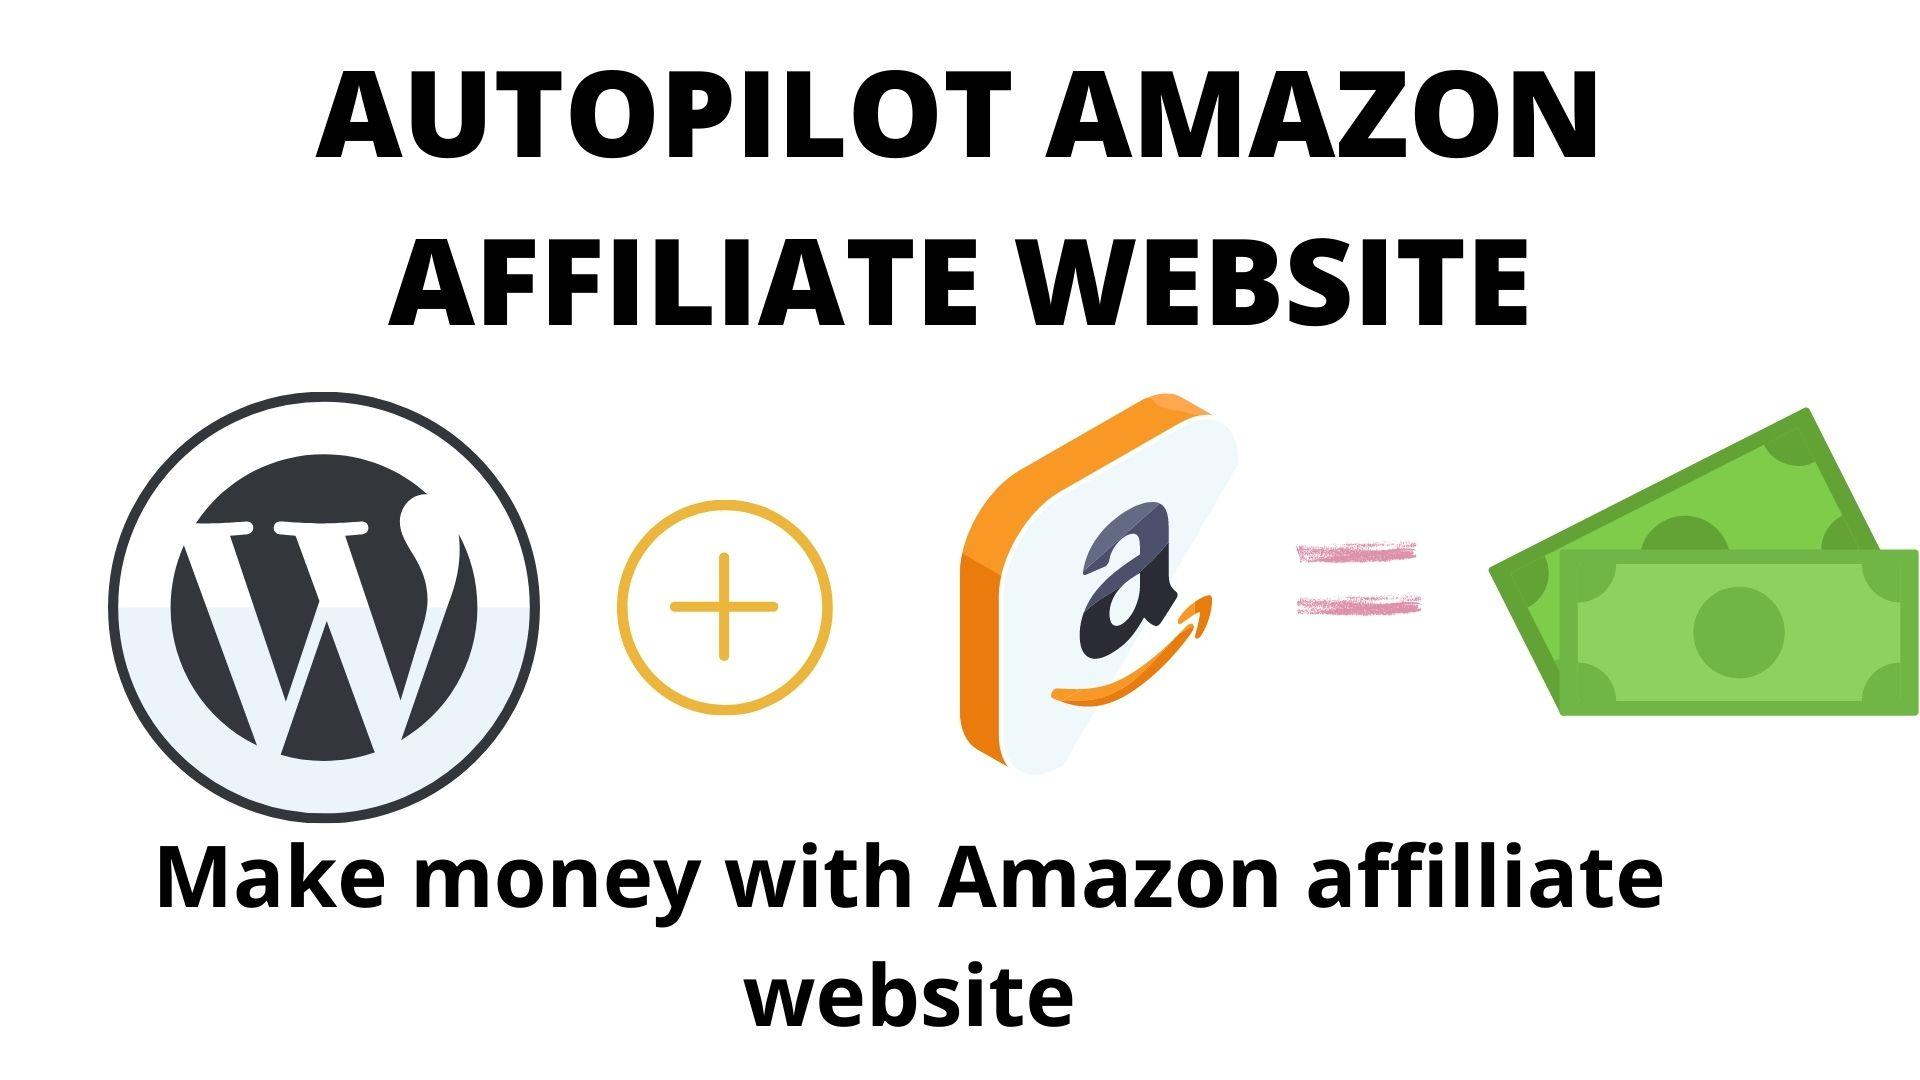 I will create autopilot amazon affiliate website for you